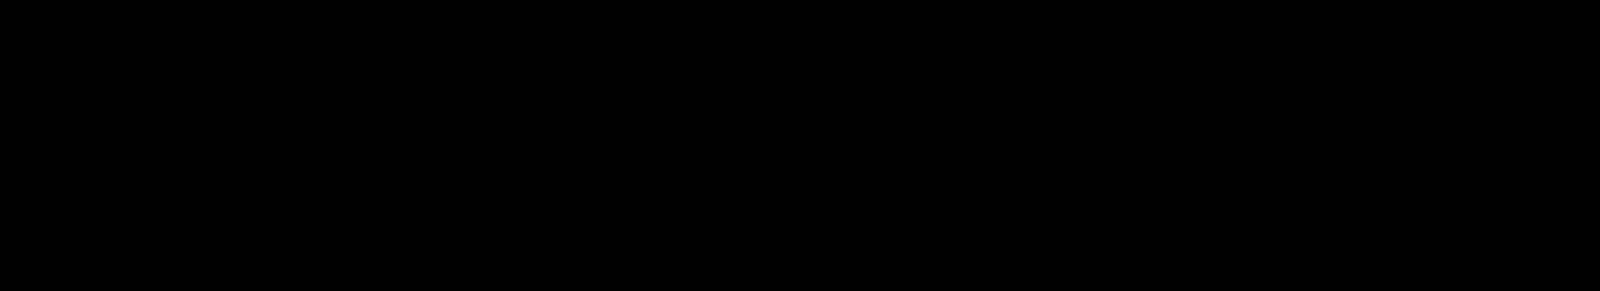 News Button SVG Clip arts